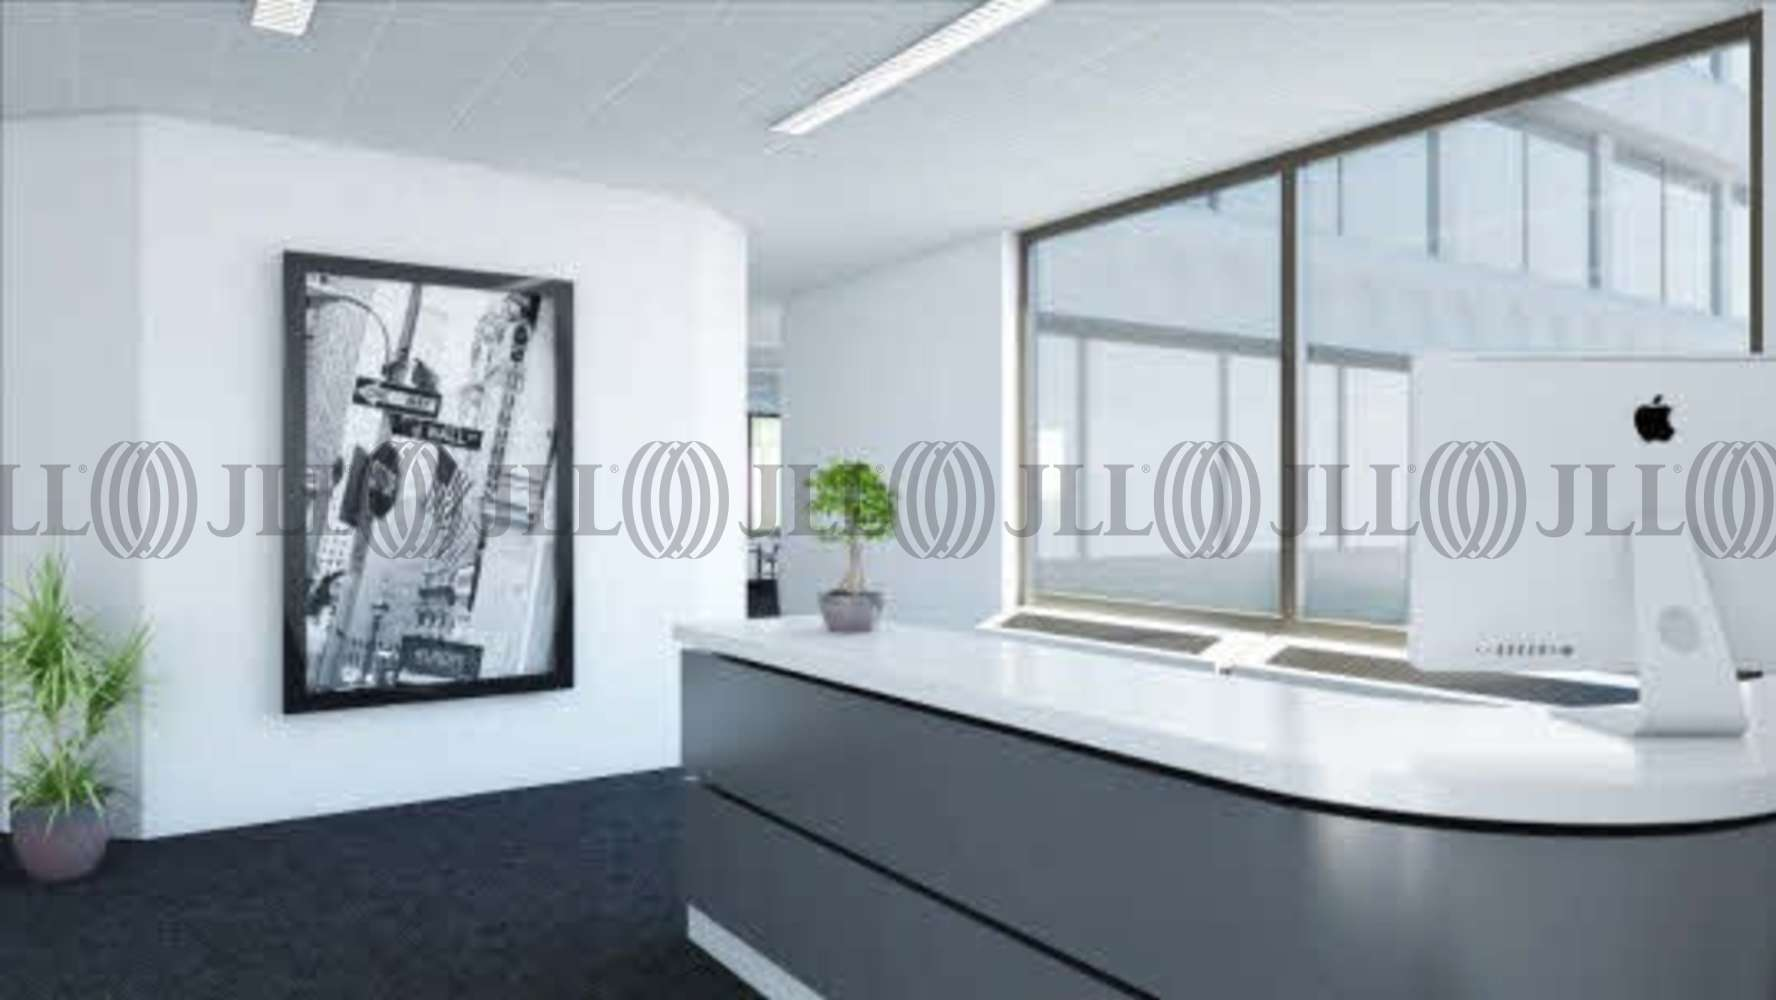 Büros Rüsselsheim, 65428 - Büro - Rüsselsheim - F1461 - 9575795